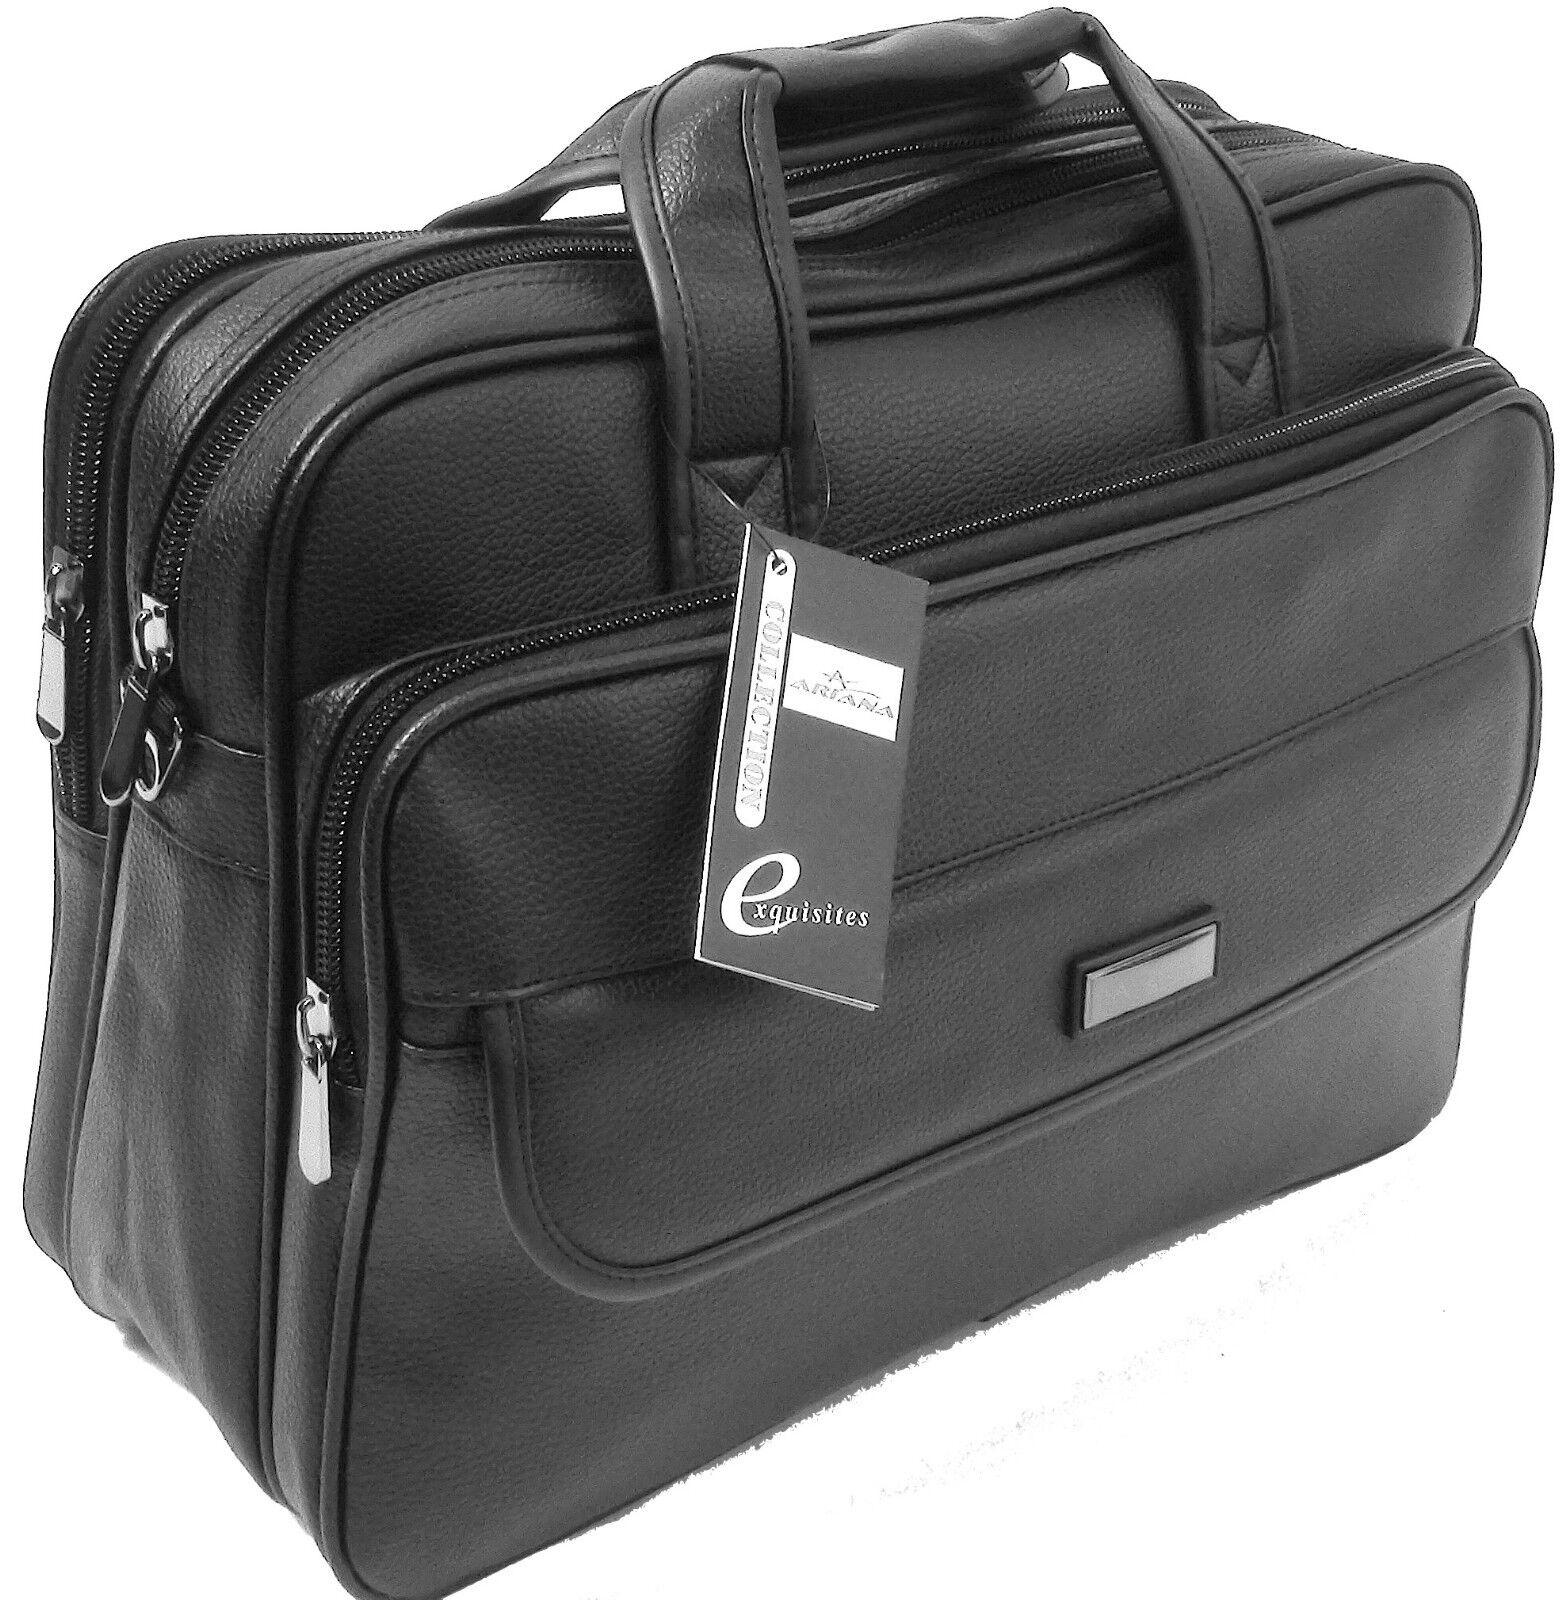 cd5f35e0f7 Mens Black Laptop Bag Messenger Briefcase Business Work Bag Leather Feel  Matt